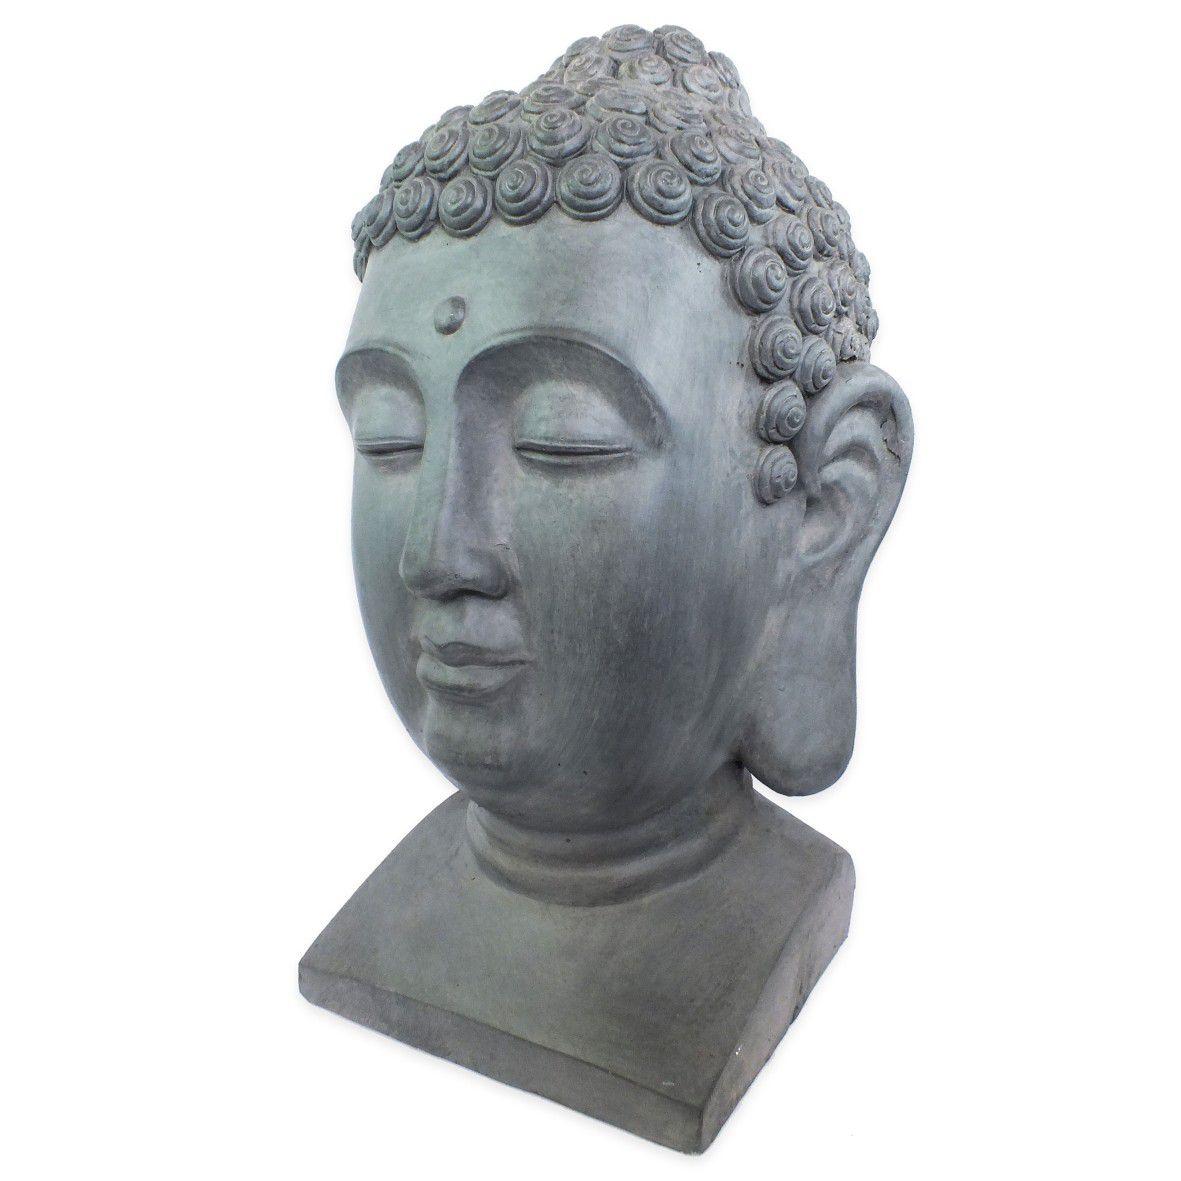 Estatueta Decorativa Cabeça Buda  - Arrivo Mobile